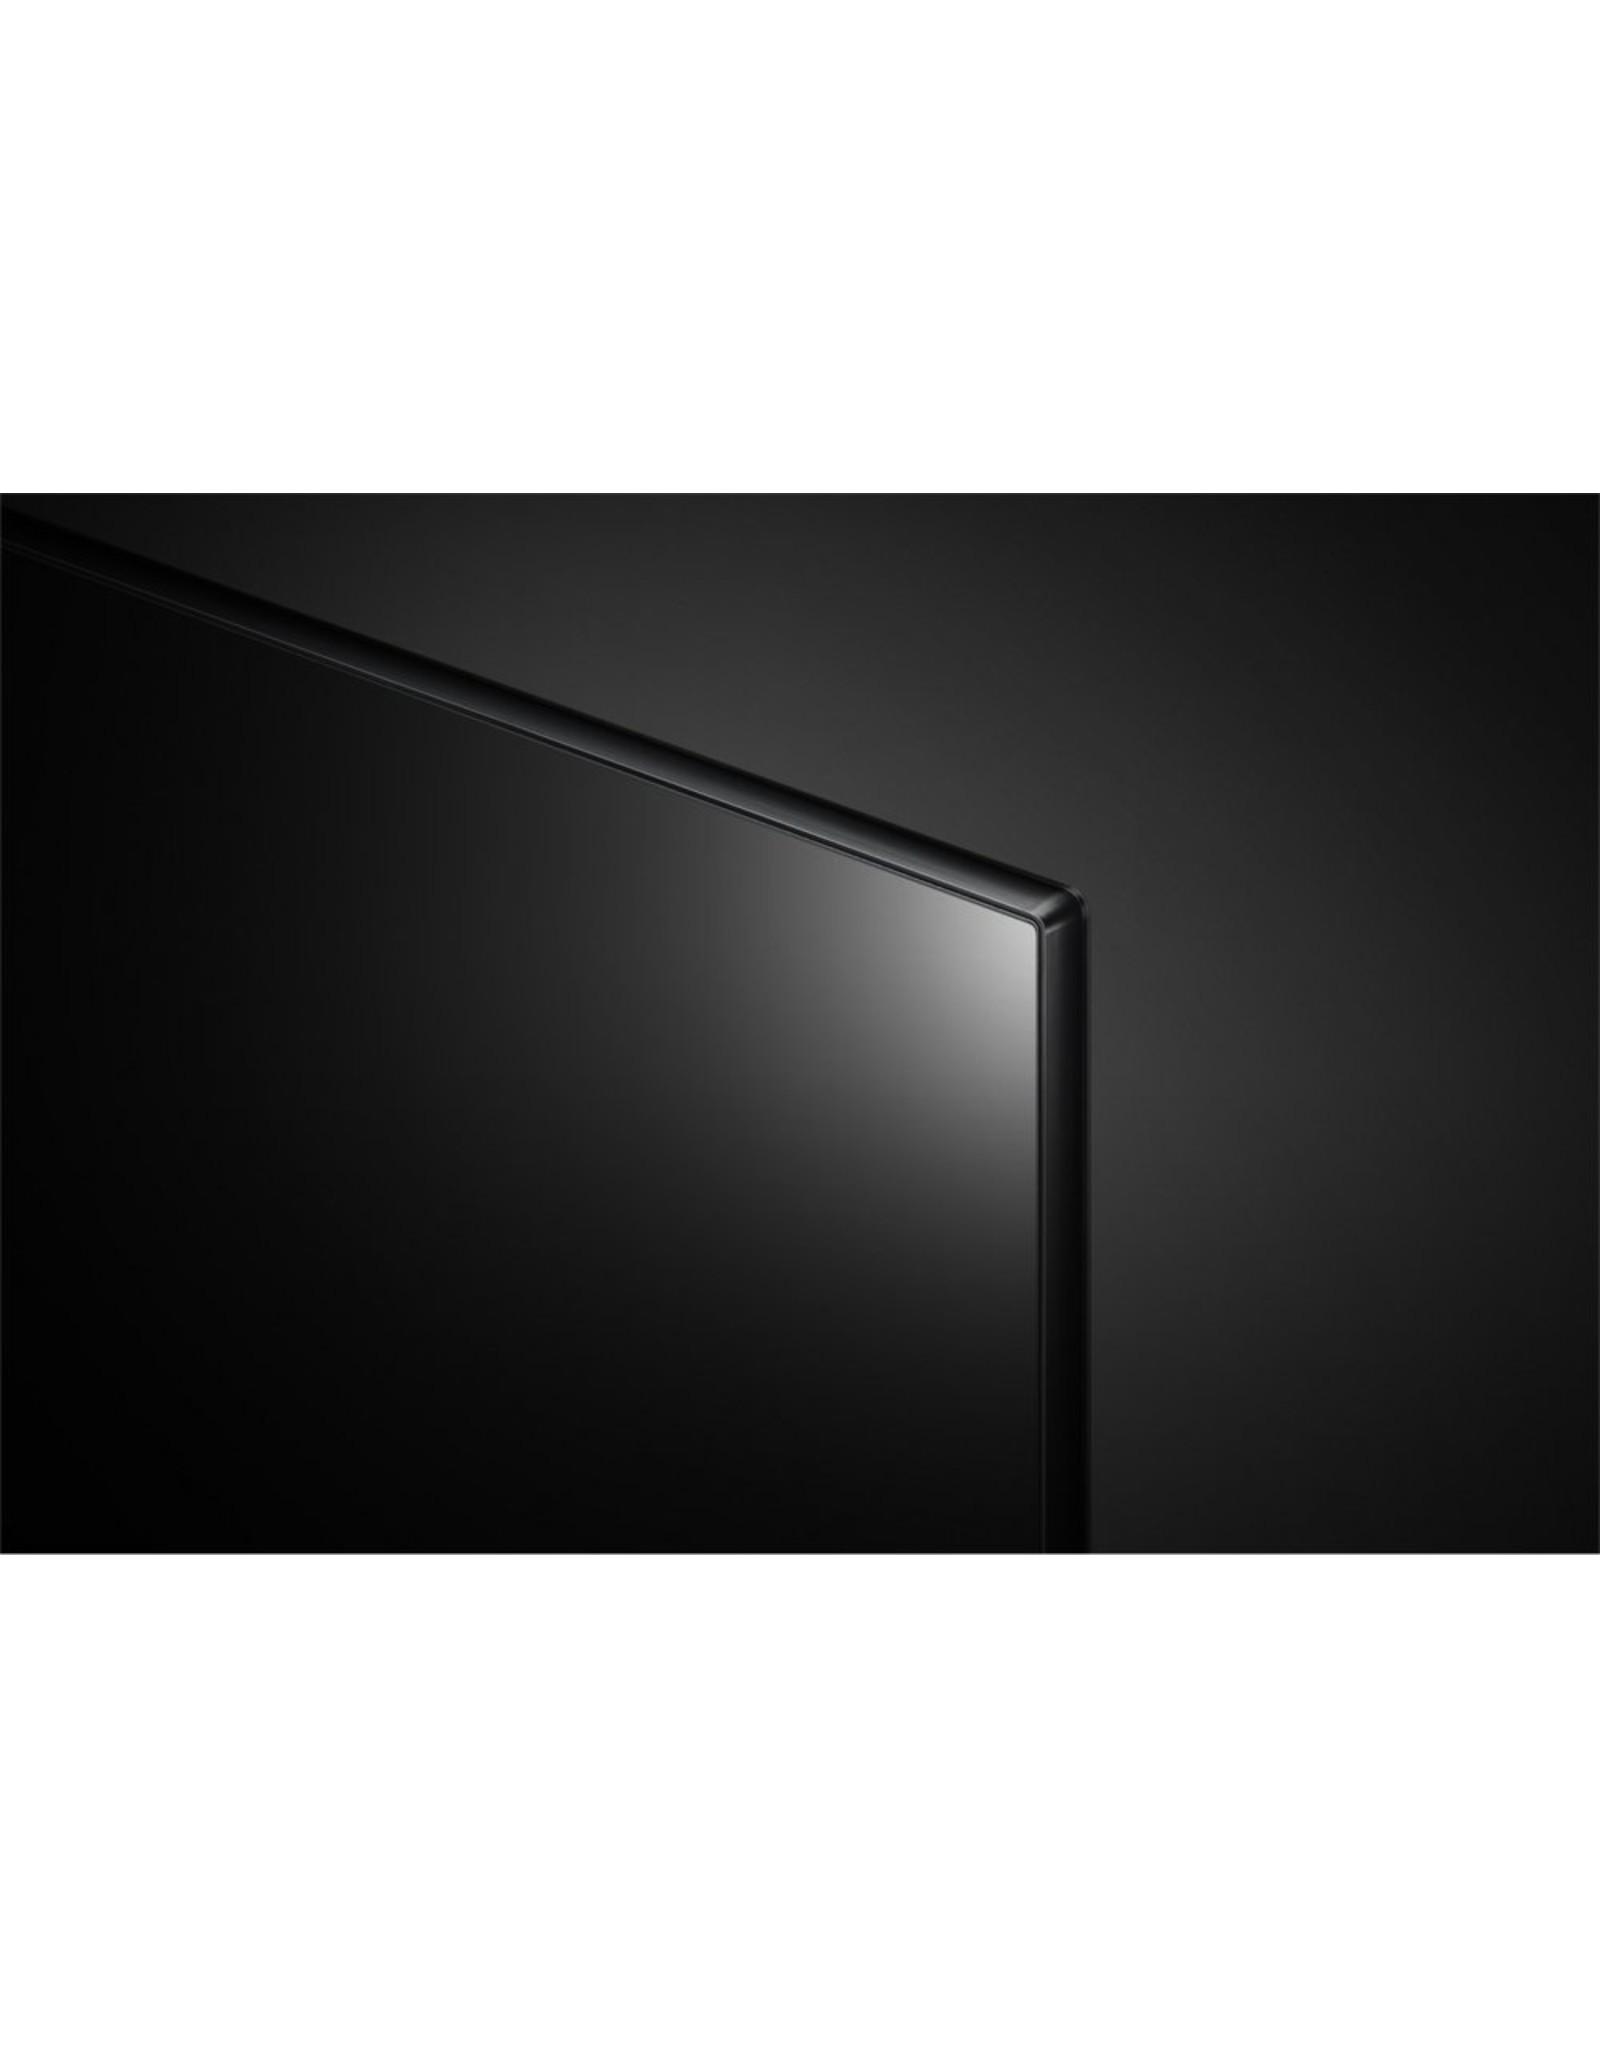 LG NanoCell 124,5cm 49inch 4K UltraHD Smart TV Wi-Fi